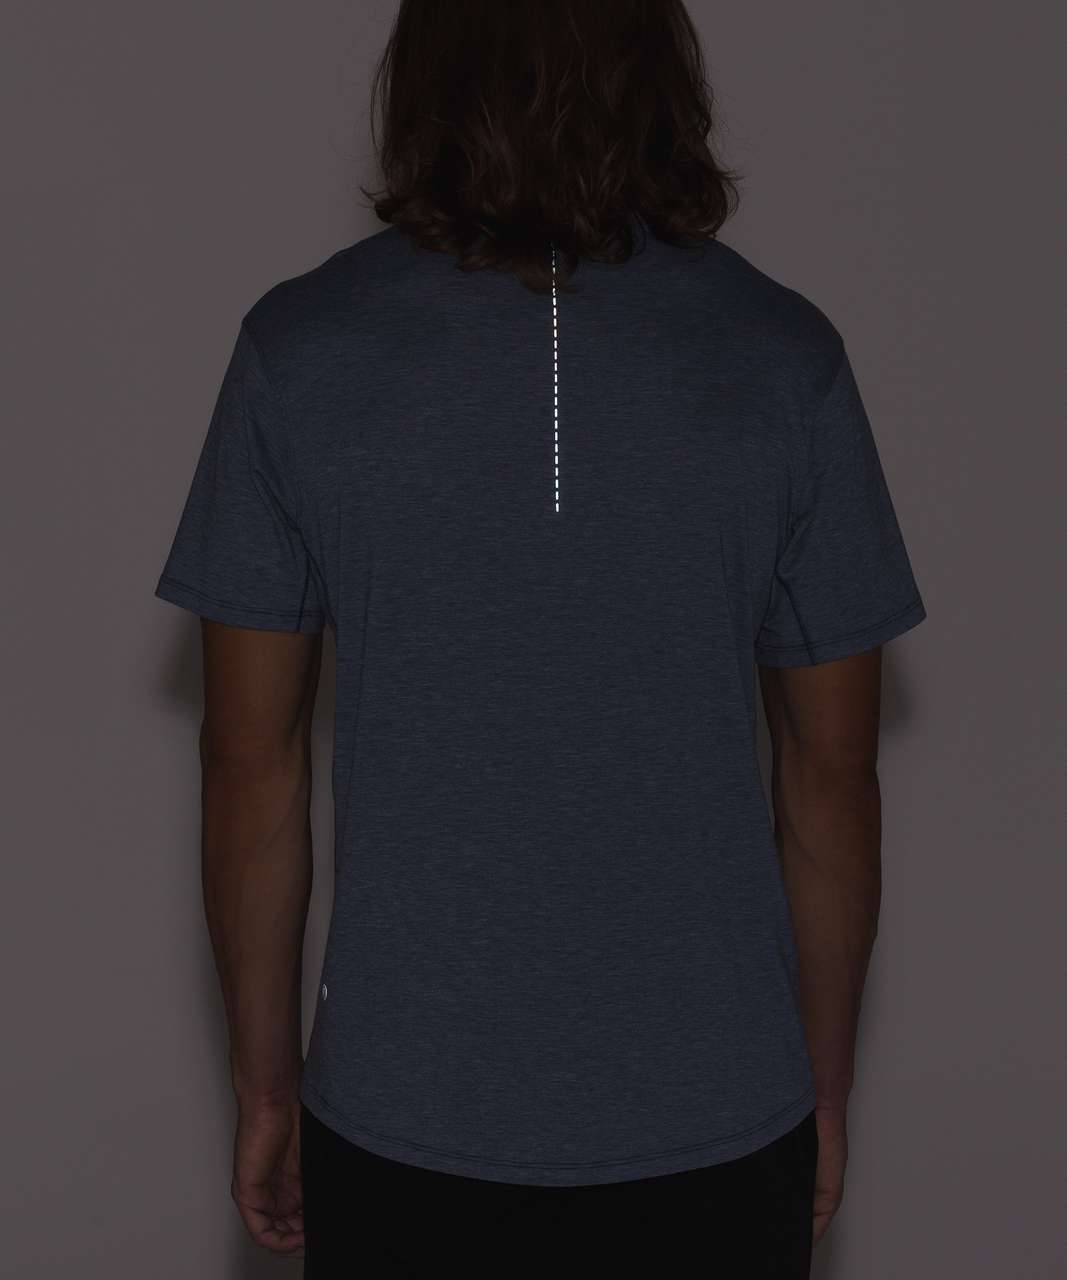 Lululemon Somatic Aero Short Sleeve - Heathered Dark Cobalt